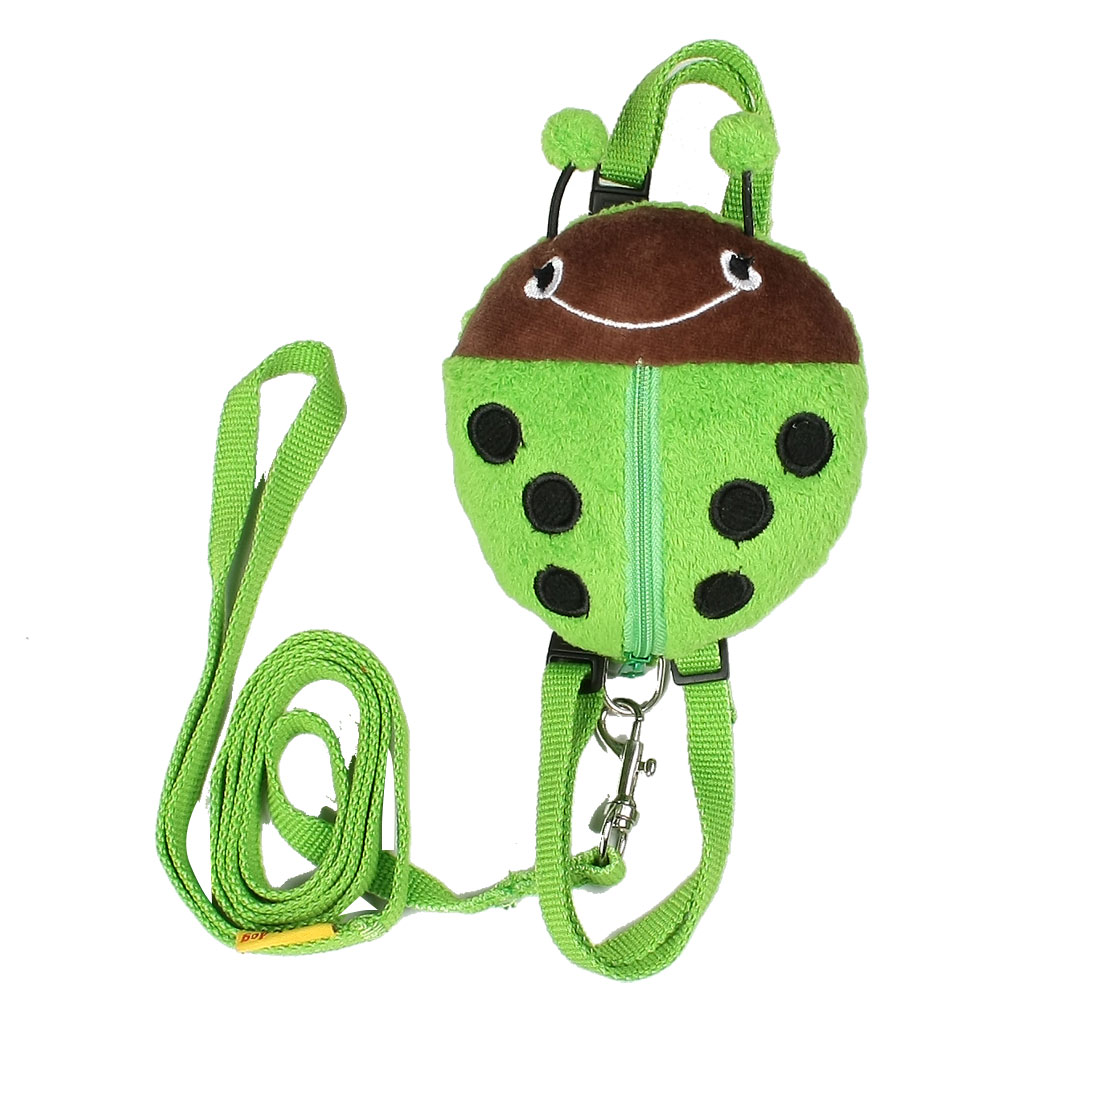 Travel Green Beetle Shape Zip UP Pet Dog Harness Leash Size M